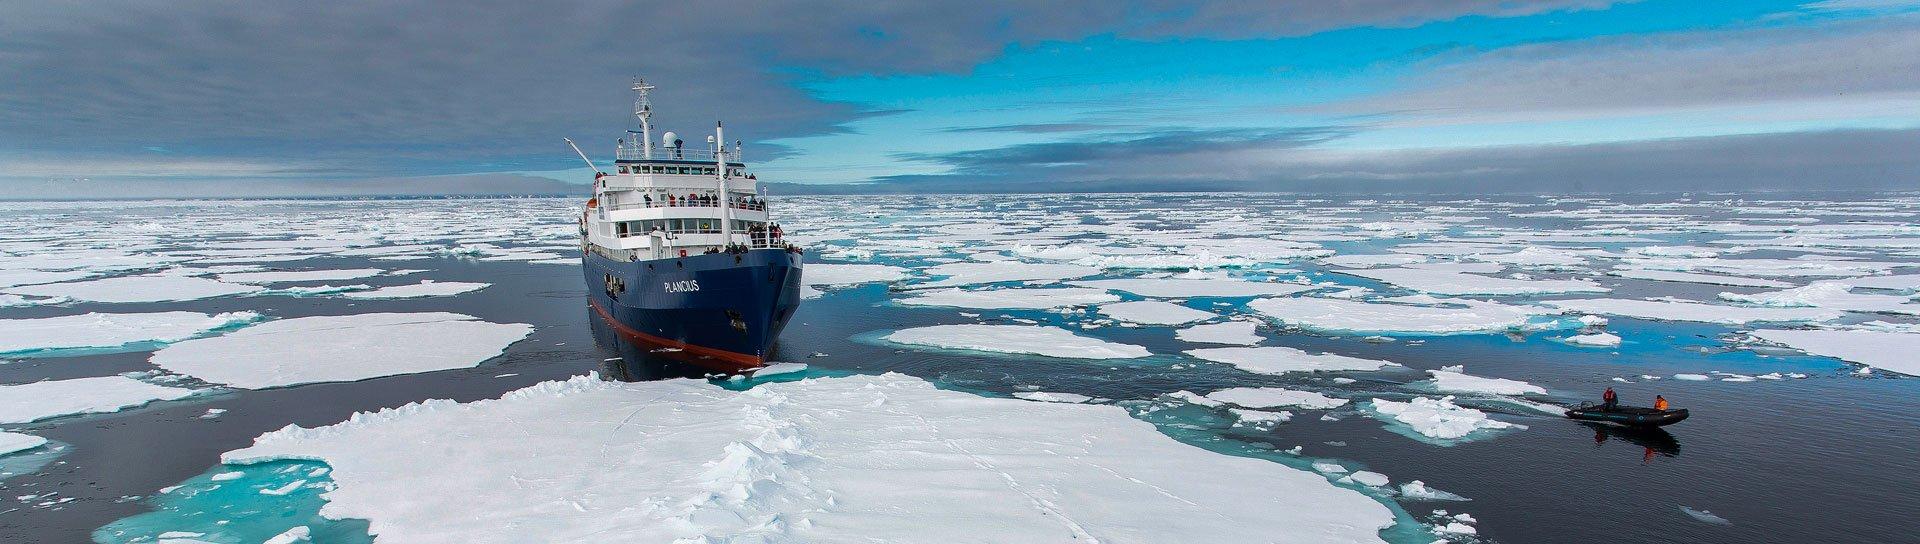 M/V Plancius - ספינת הפלגה לשפיצברגן ואנטארקטיקה Wild Travel